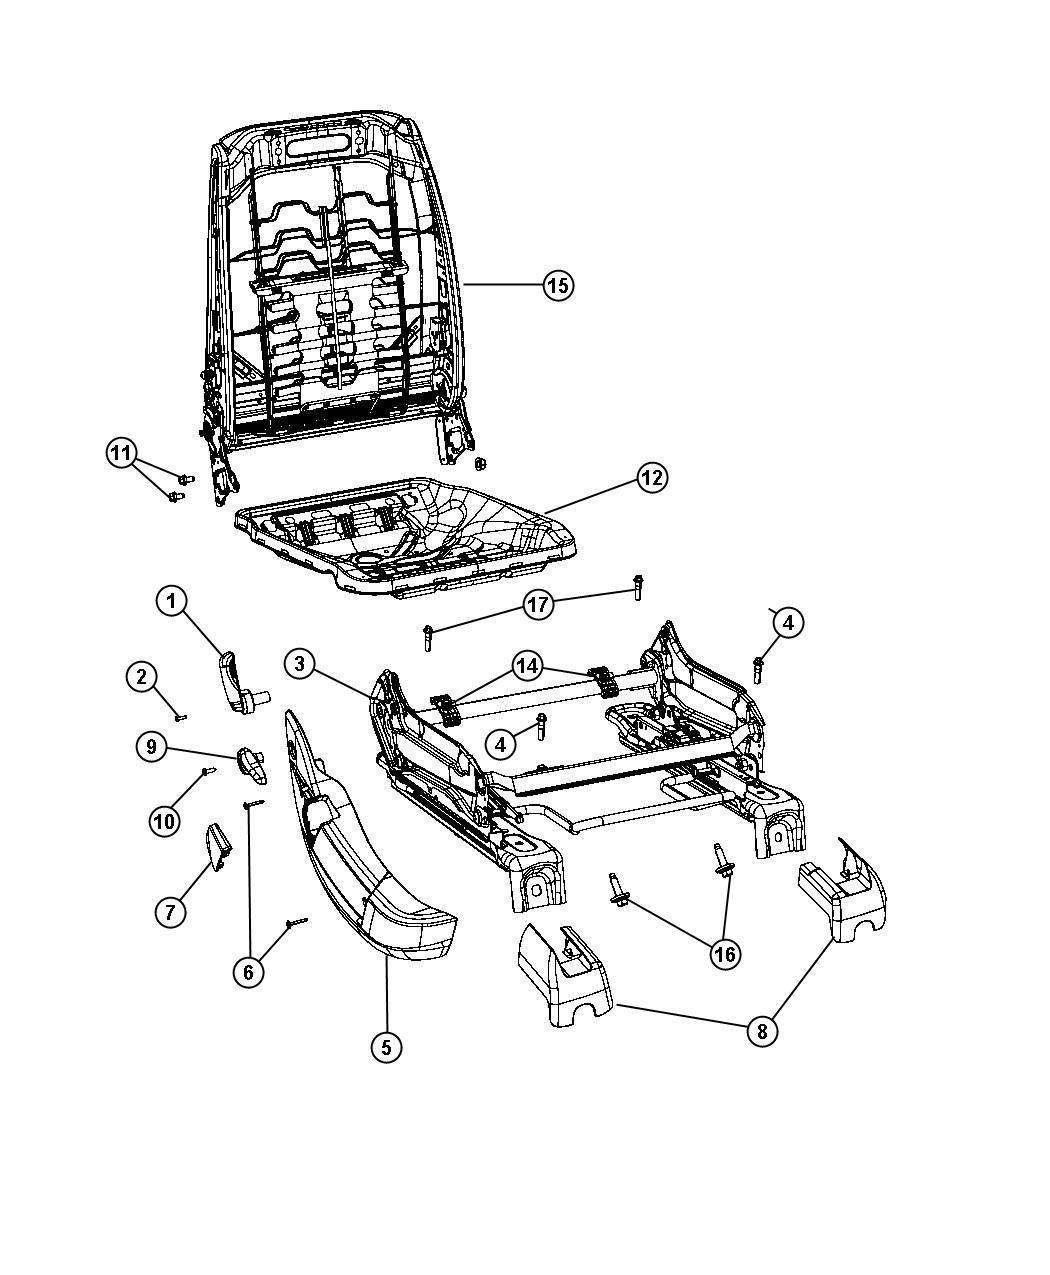 2009 Dodge Charger Bolt. Trim: [lux leather trimmed bucket